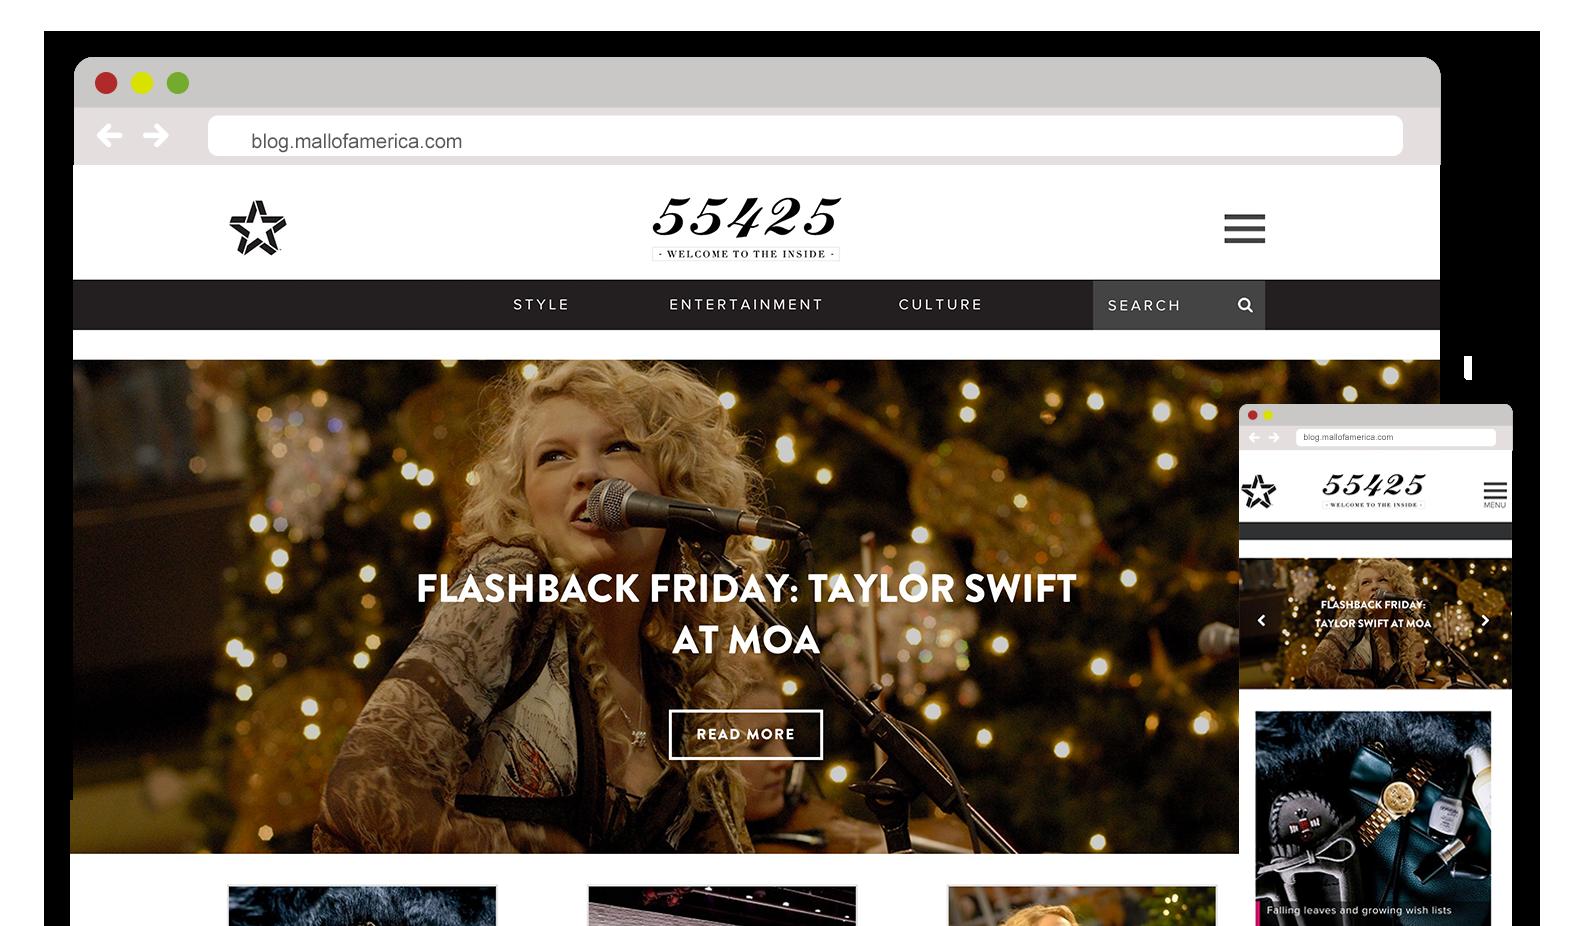 Web Design of Blog - Mall of America - Website design